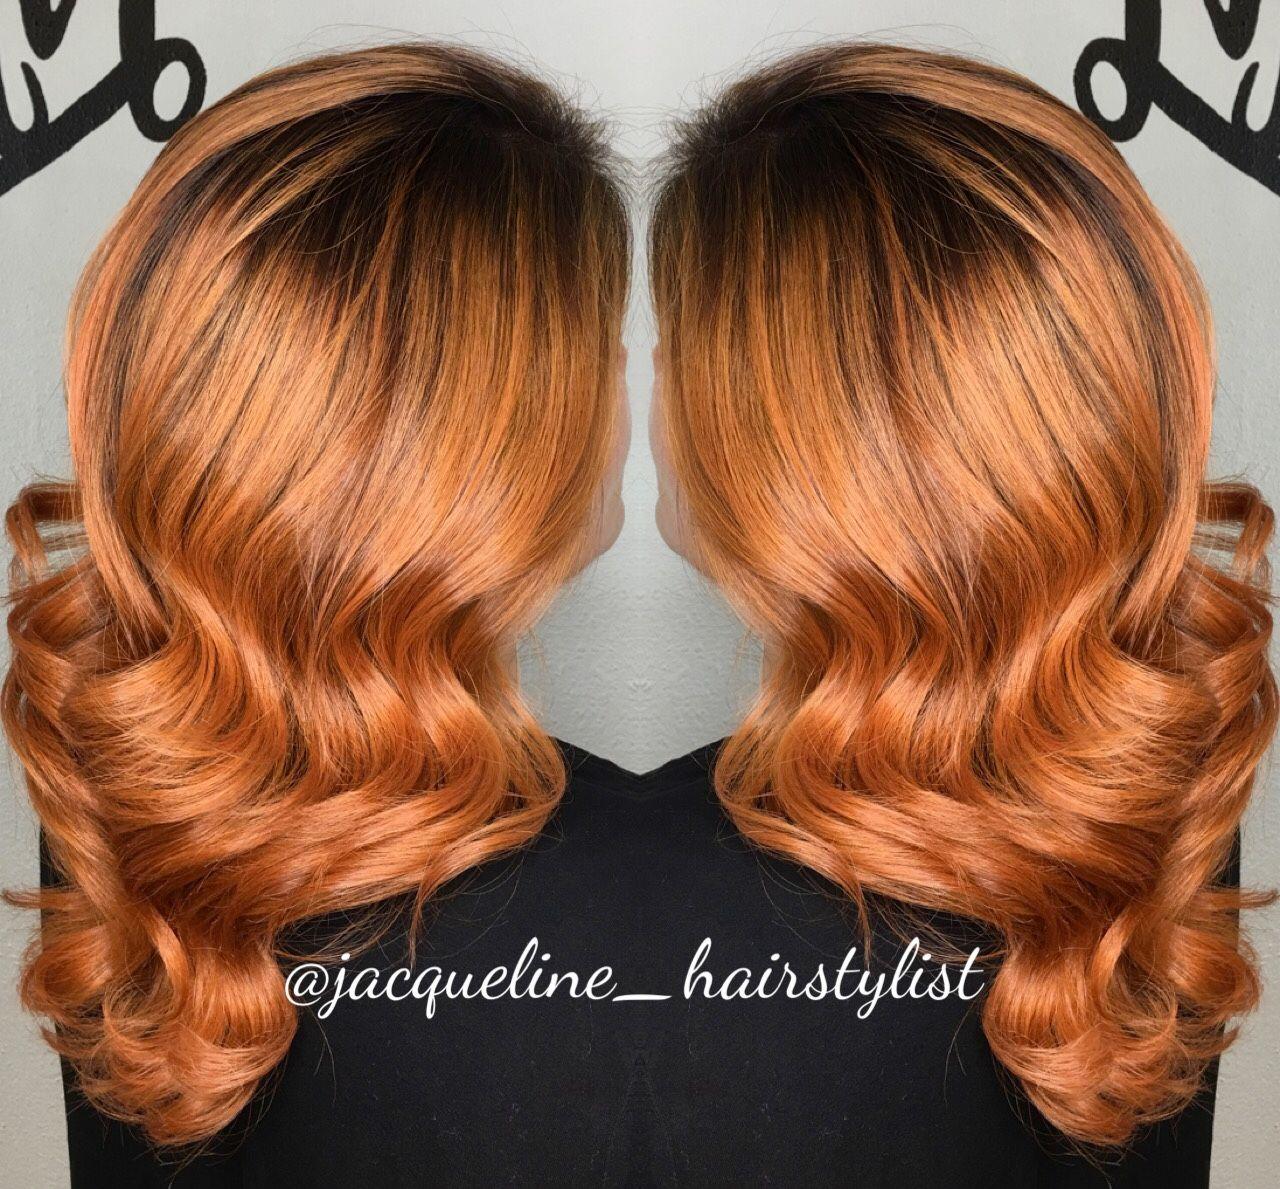 Burnt orange colormelt, haircut and style @jacqueline ...